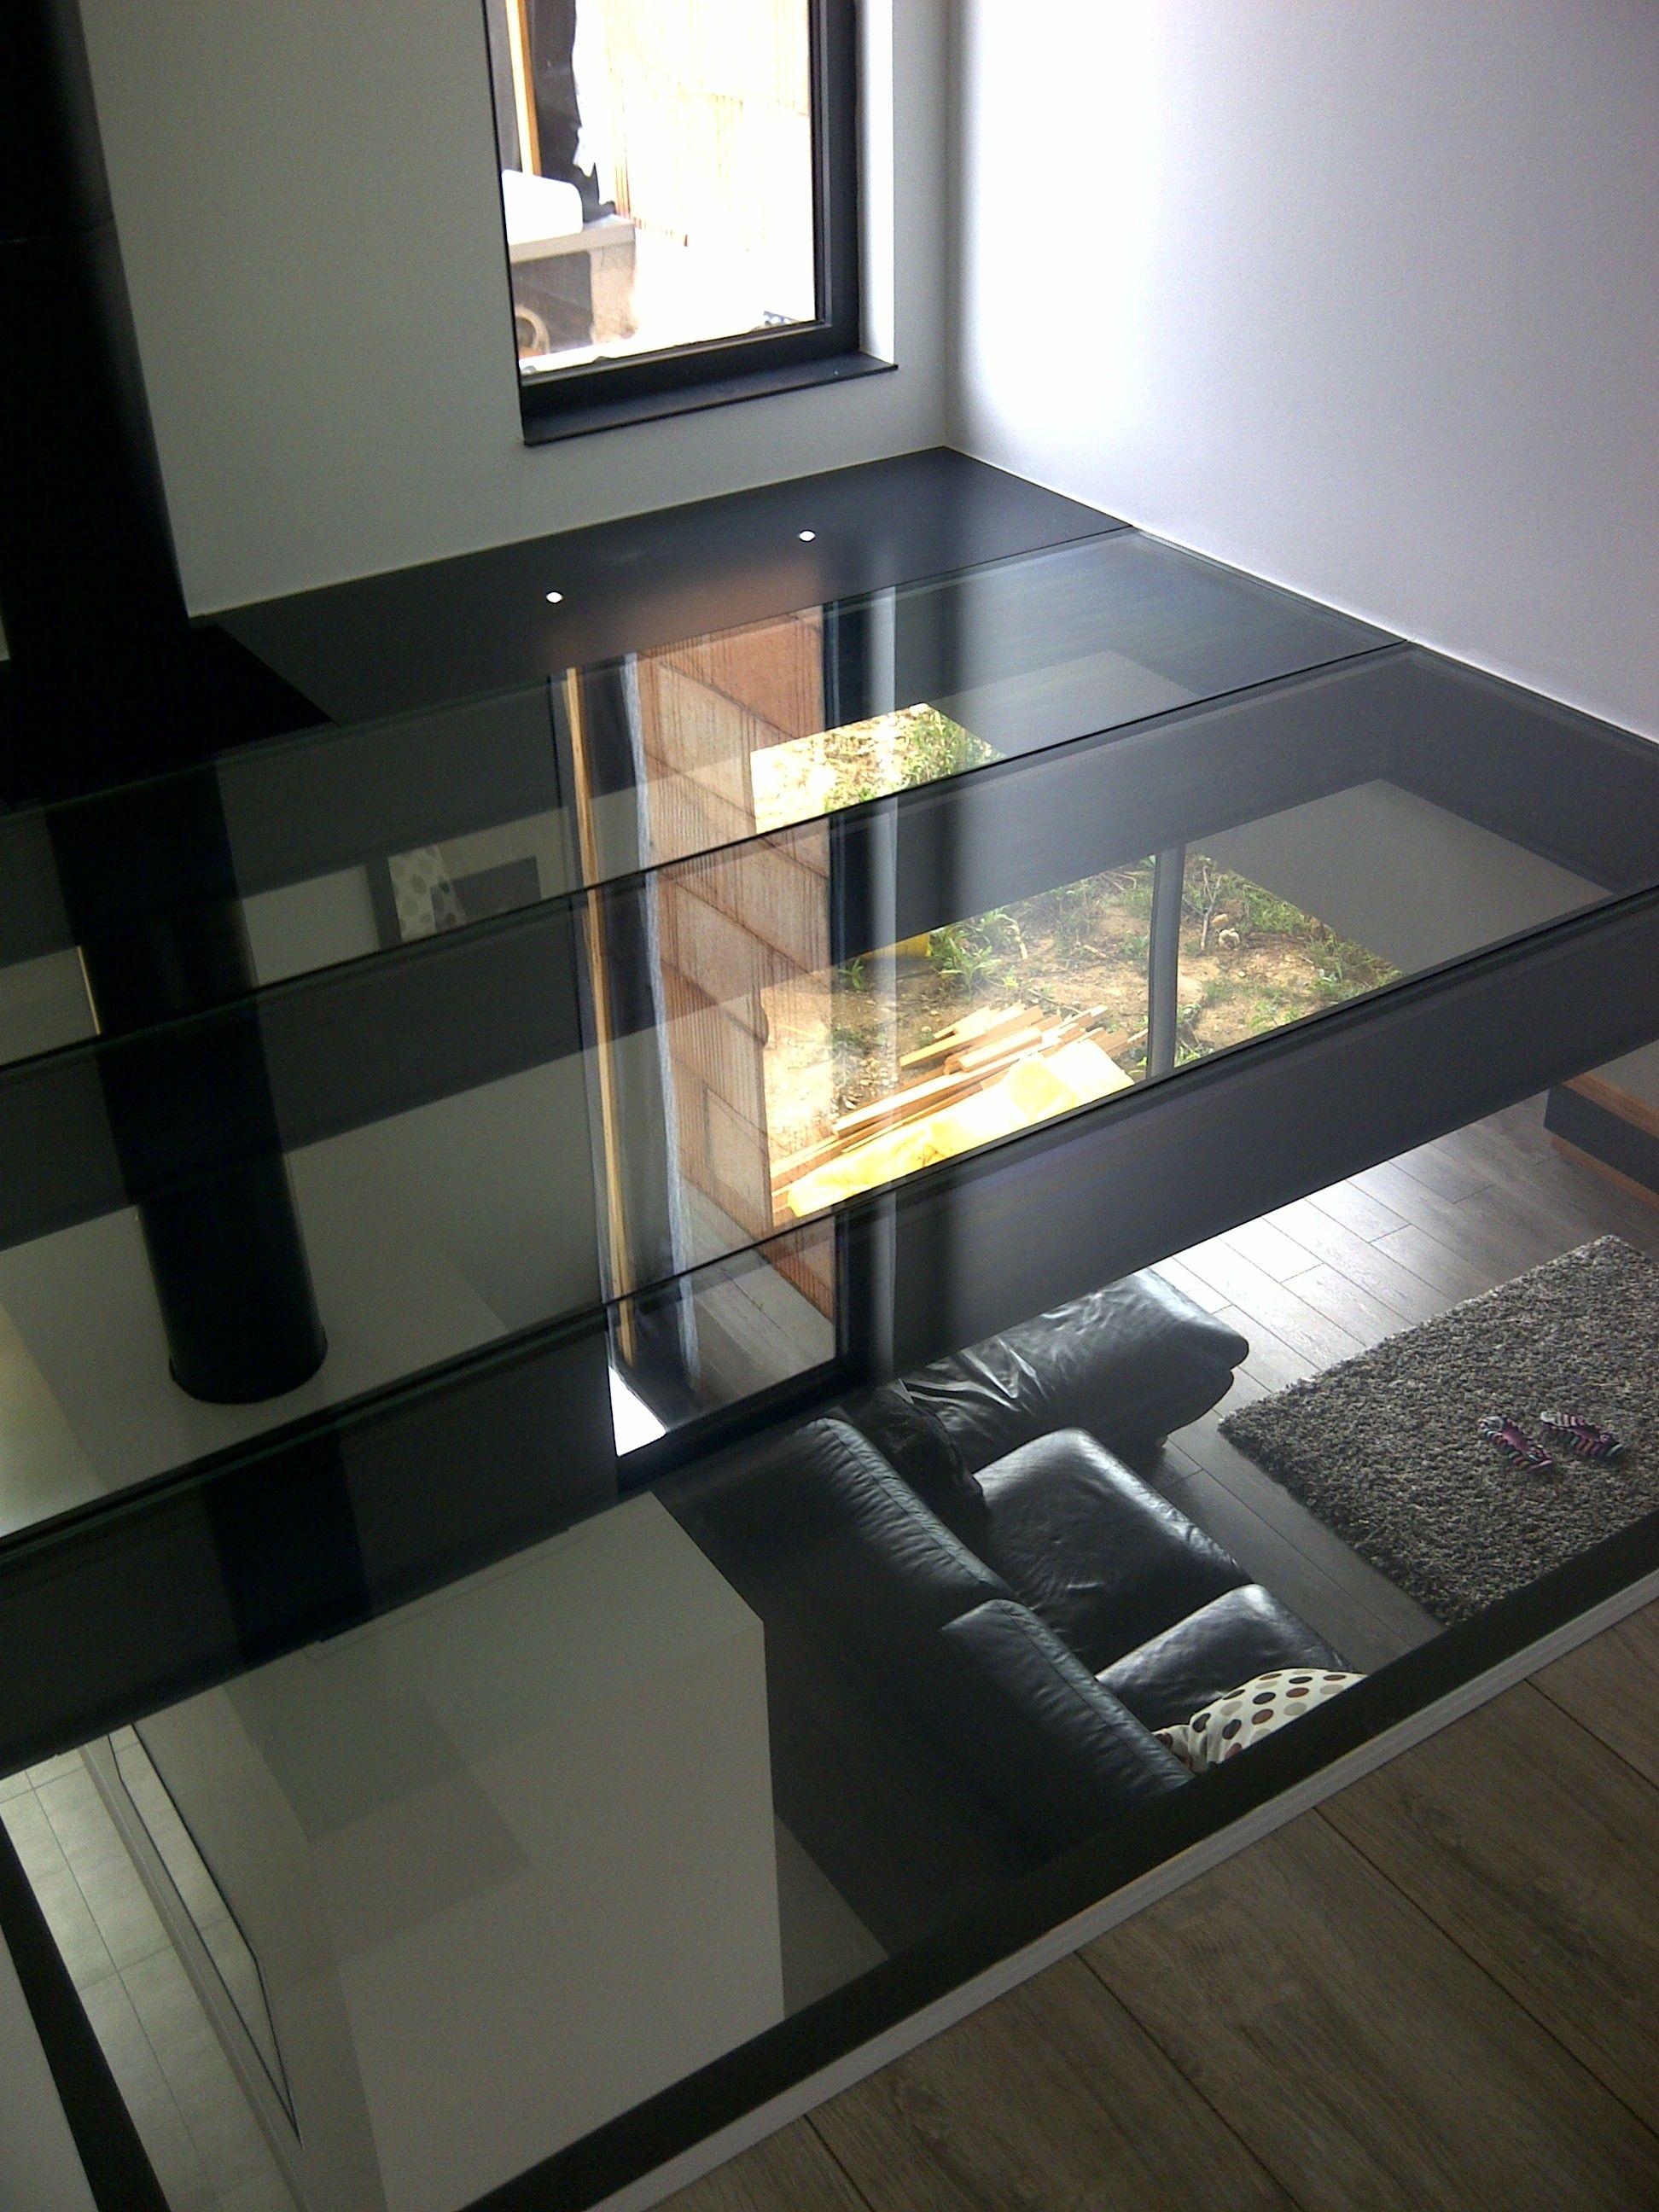 dalle en verre pour int rieur glass floor for interior home proyectos que debo intentar. Black Bedroom Furniture Sets. Home Design Ideas